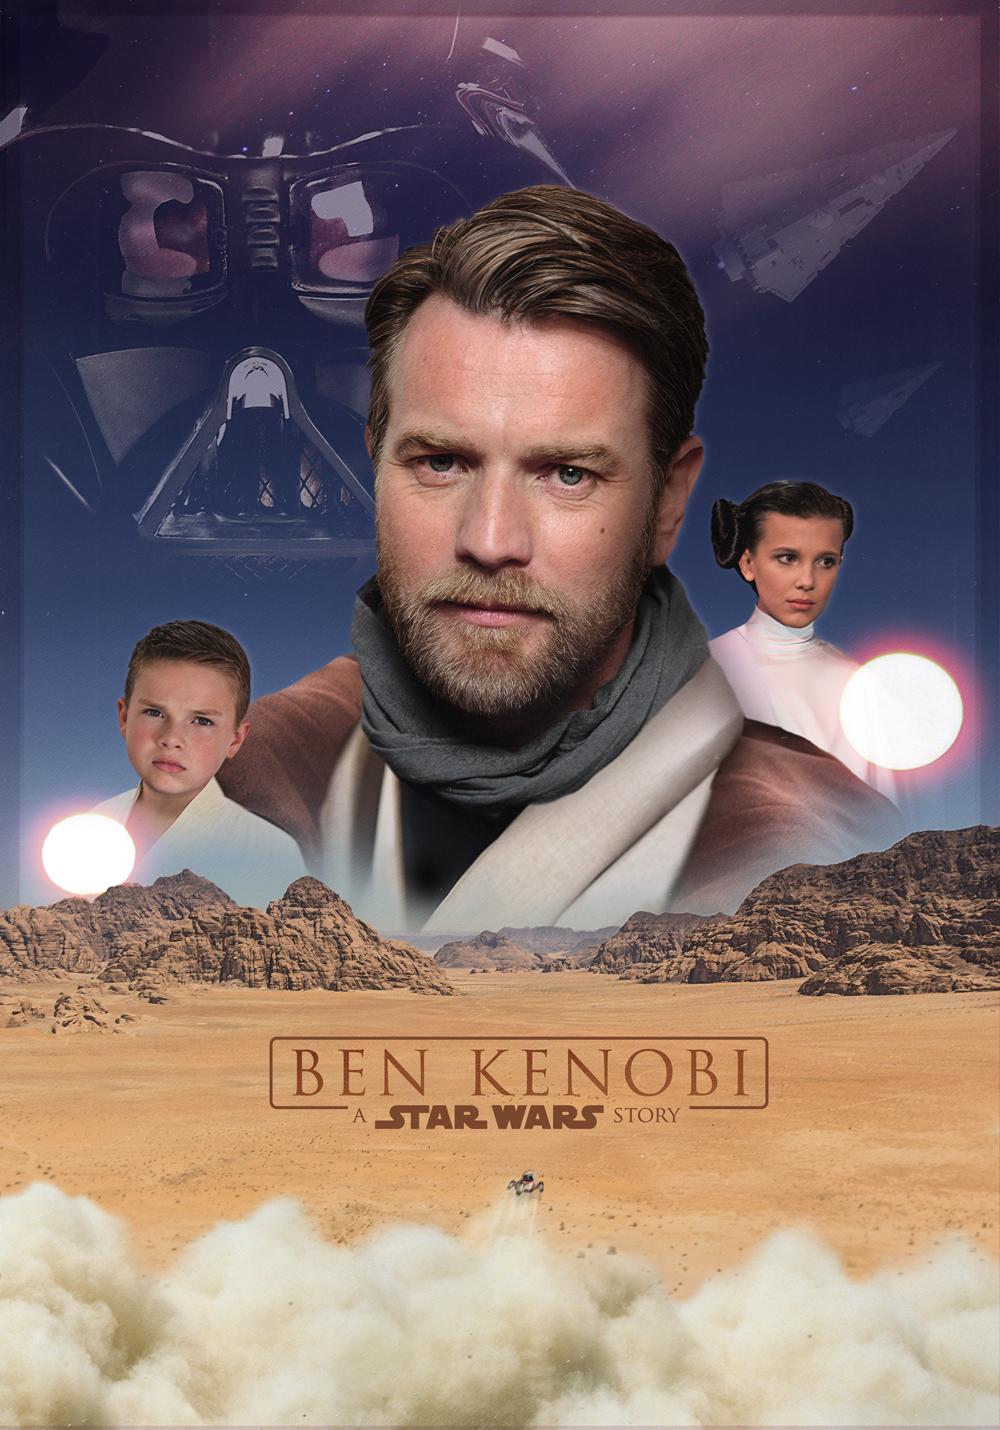 Kenobi A Star Wars Story